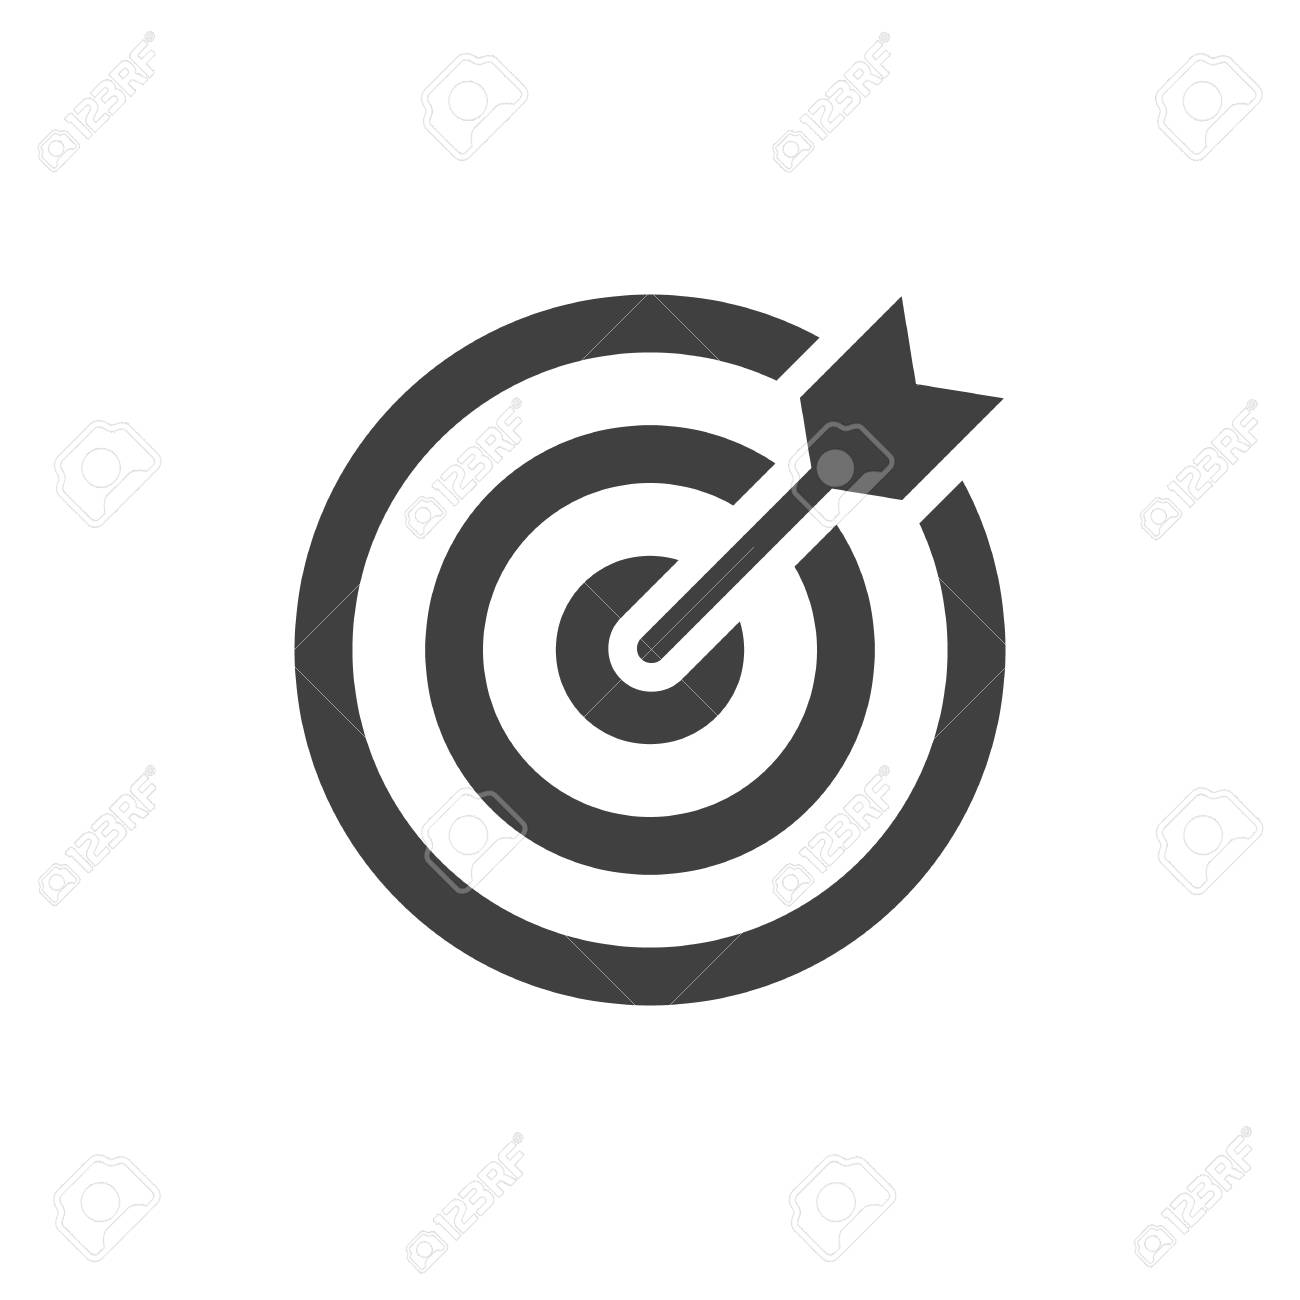 Target black icon on white background - 124654675